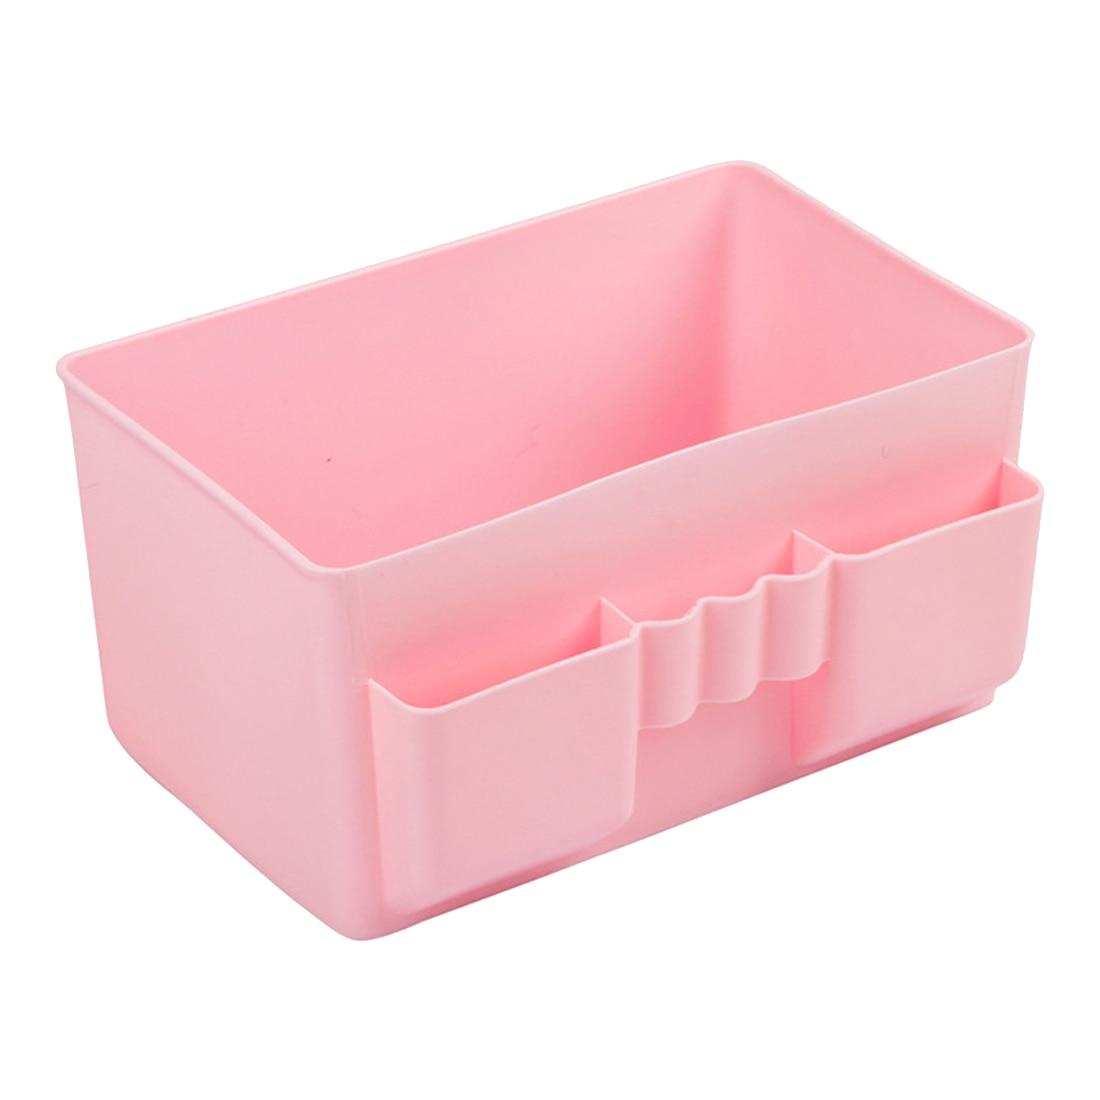 Best Hot Sale Cute Plastic Office Desktop Storage Boxes Makeup Organizer Storage Box #69829(pink)